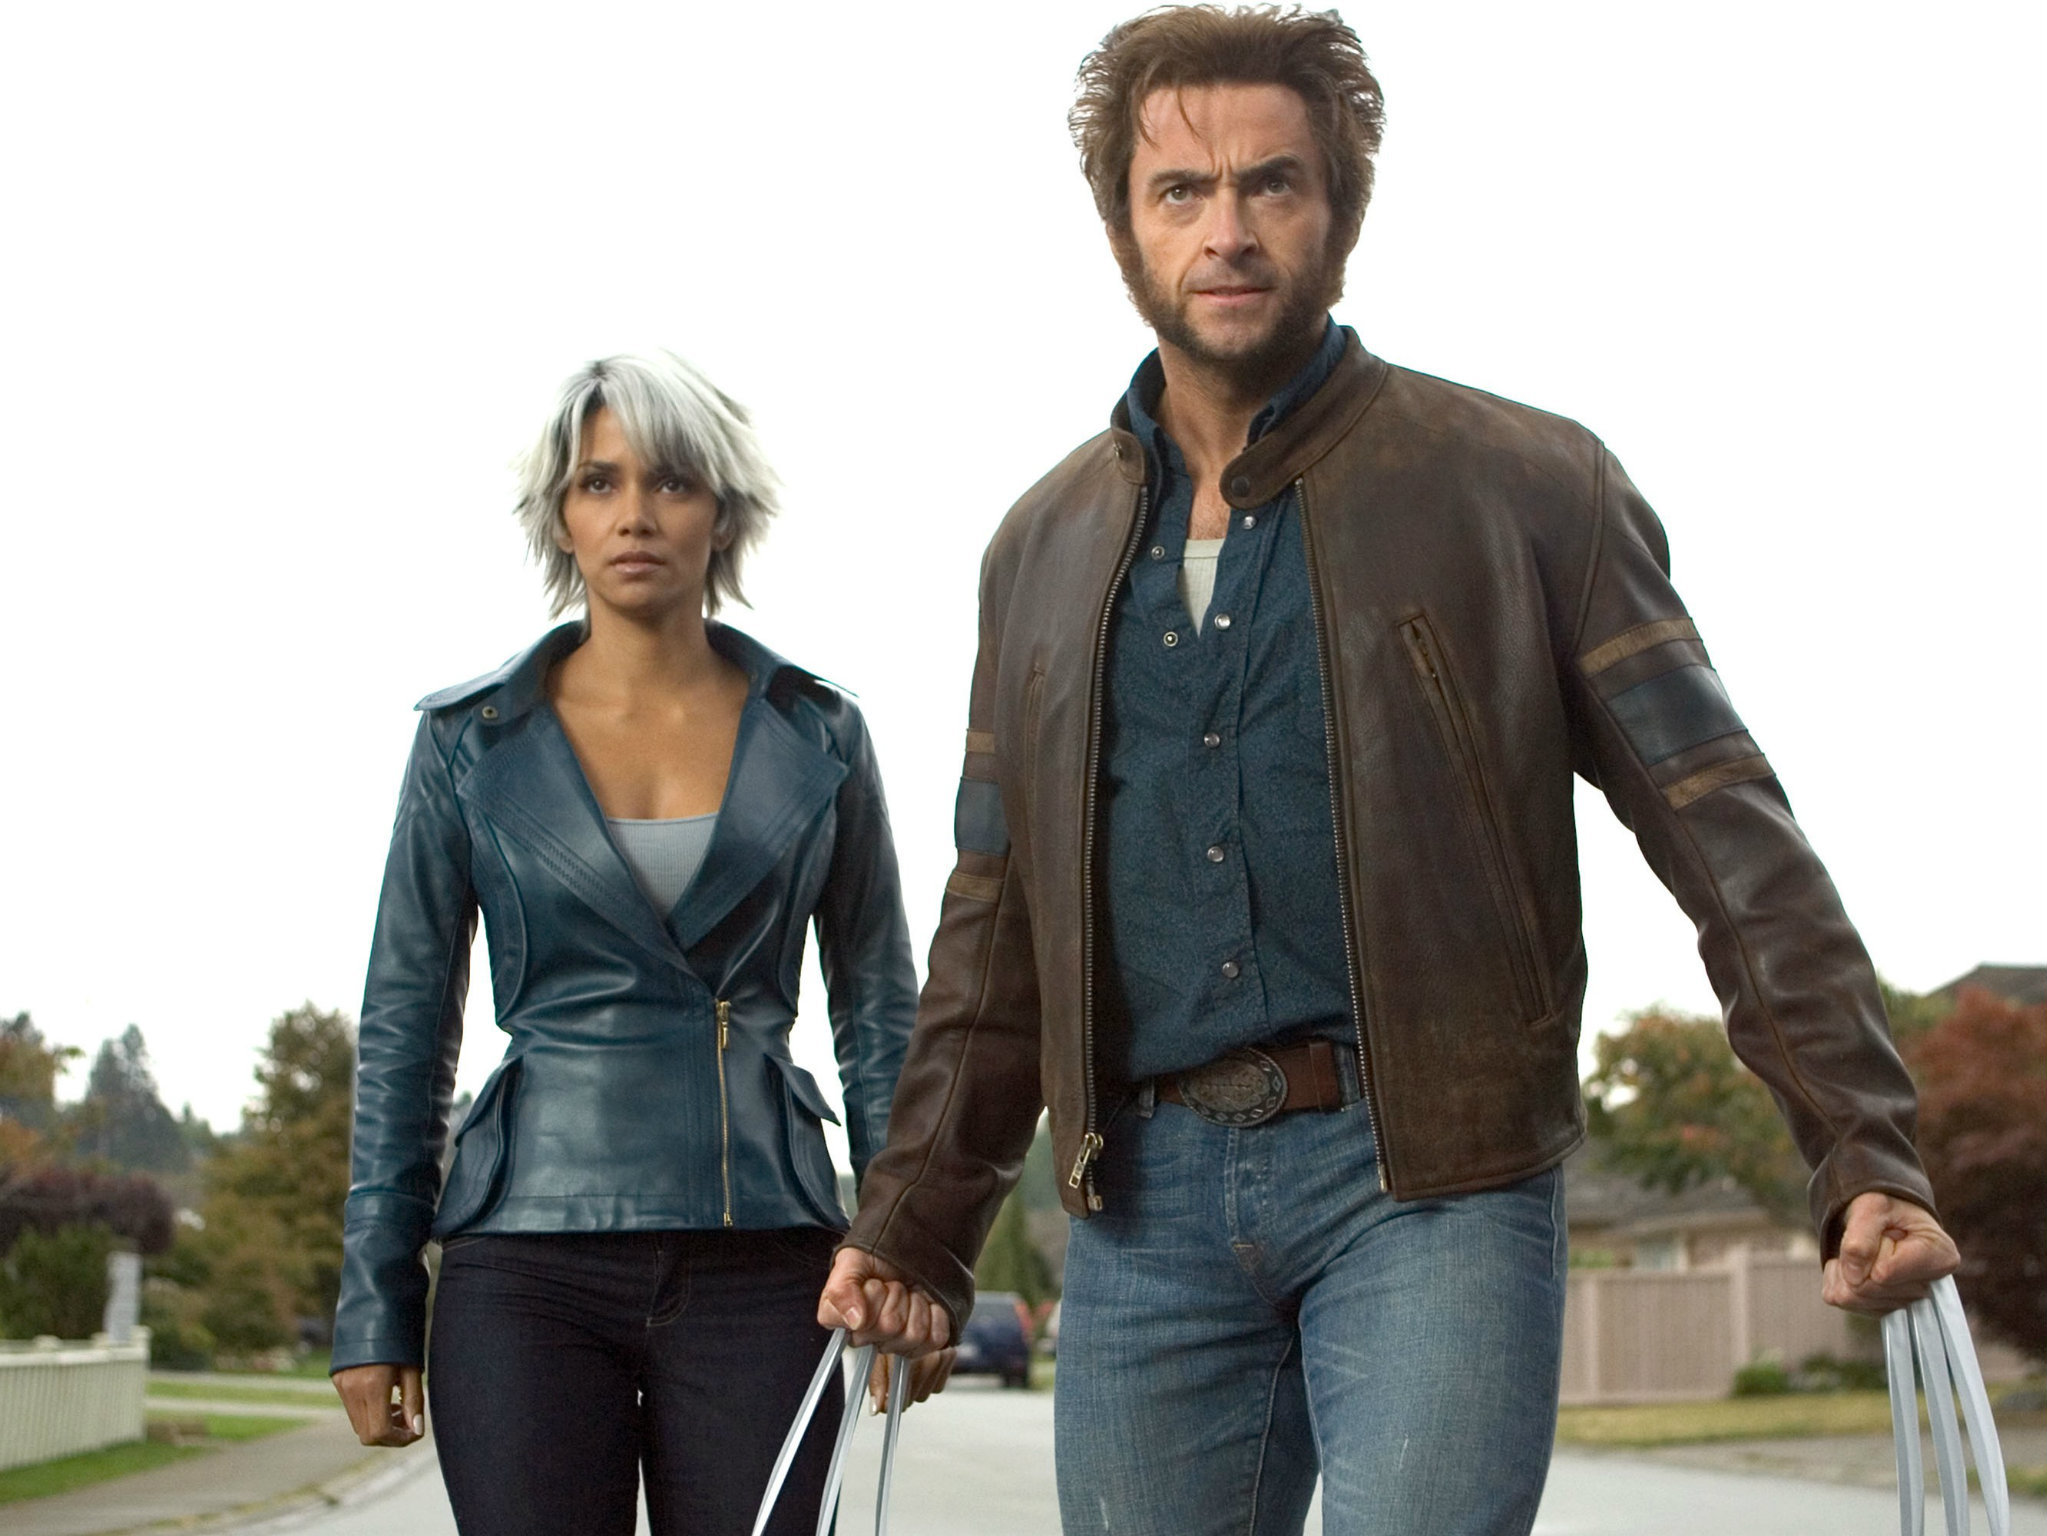 X-Men III: La batalla final, 2006 (trilogía 1)